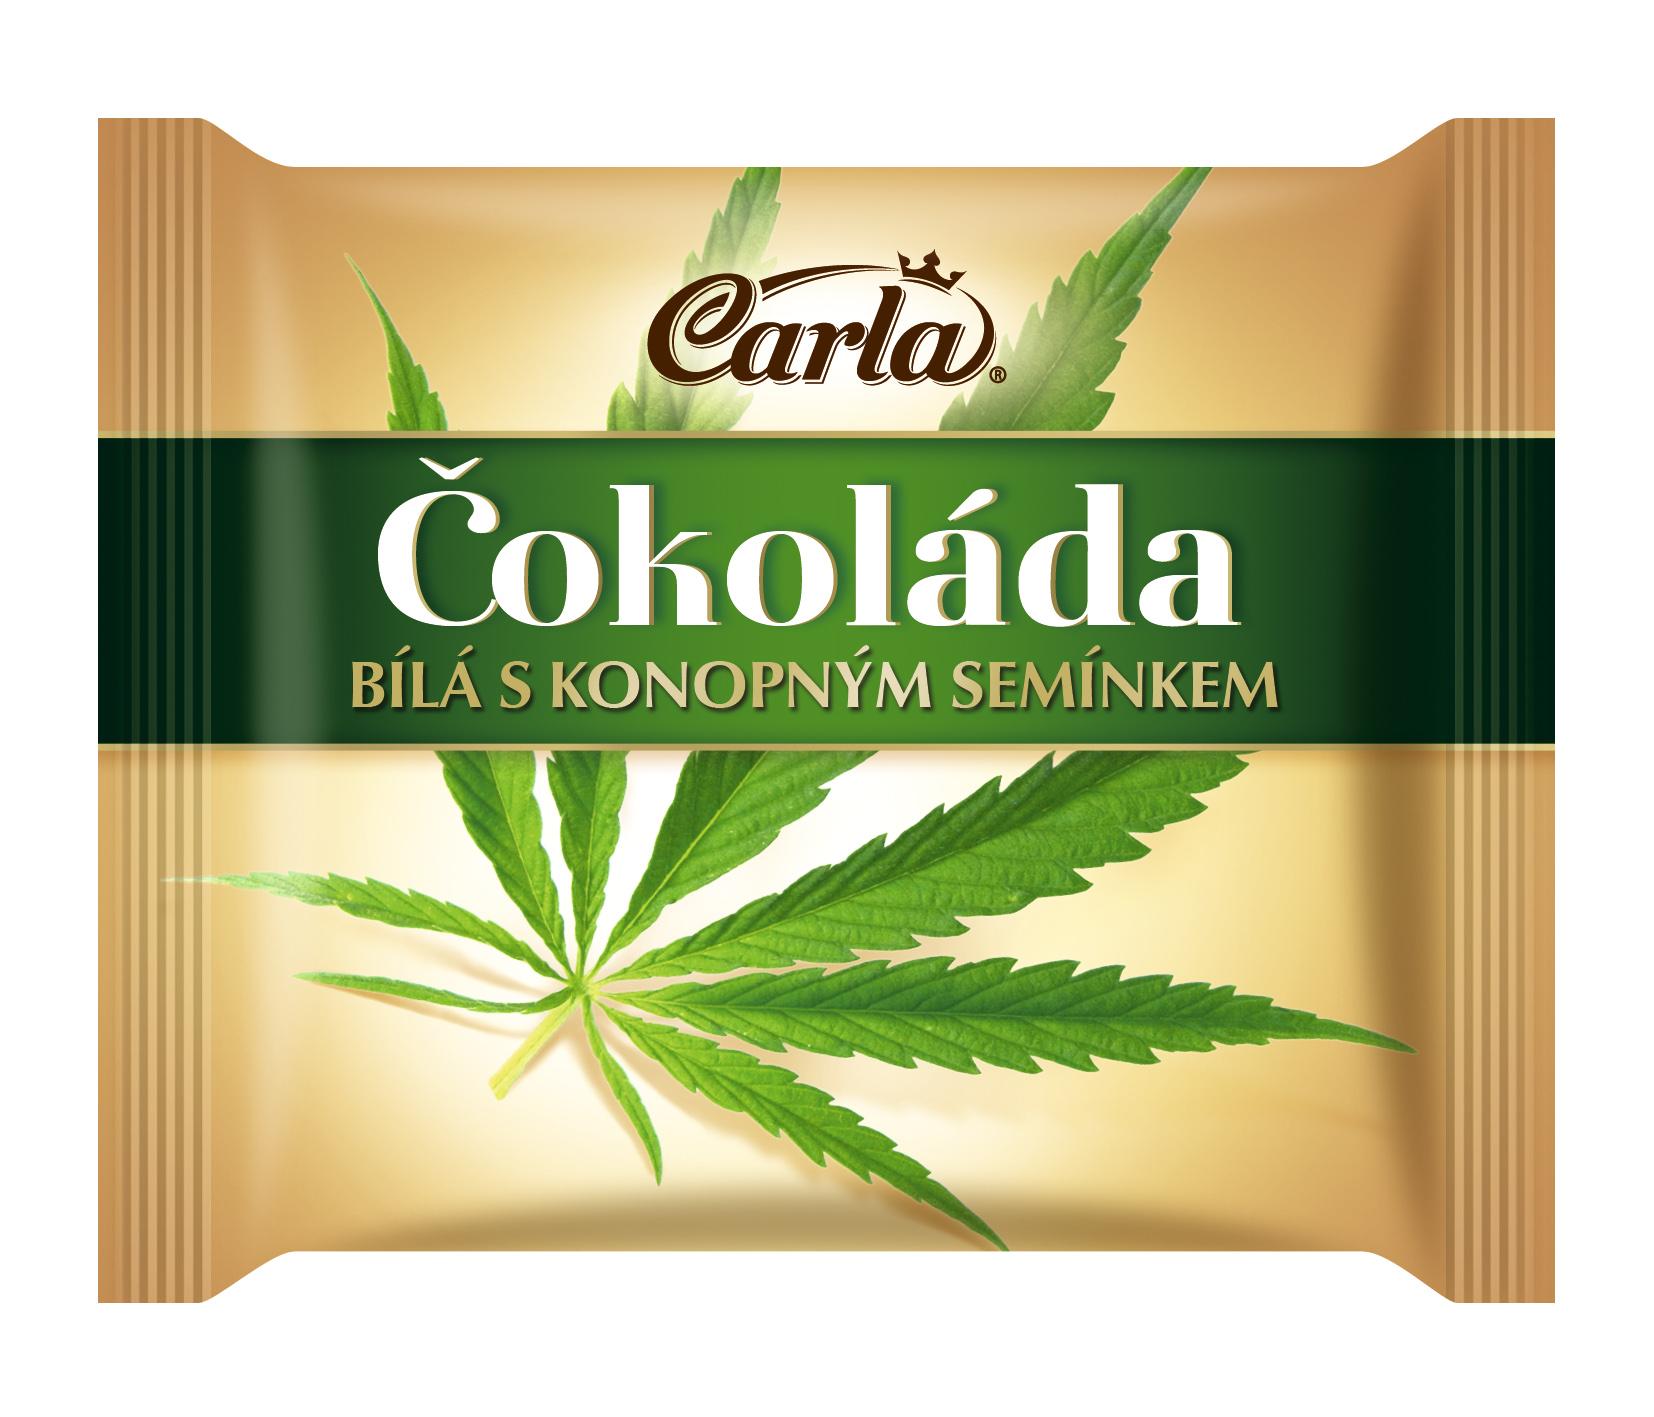 Značka Čokoláda bílá s konopným semínkem